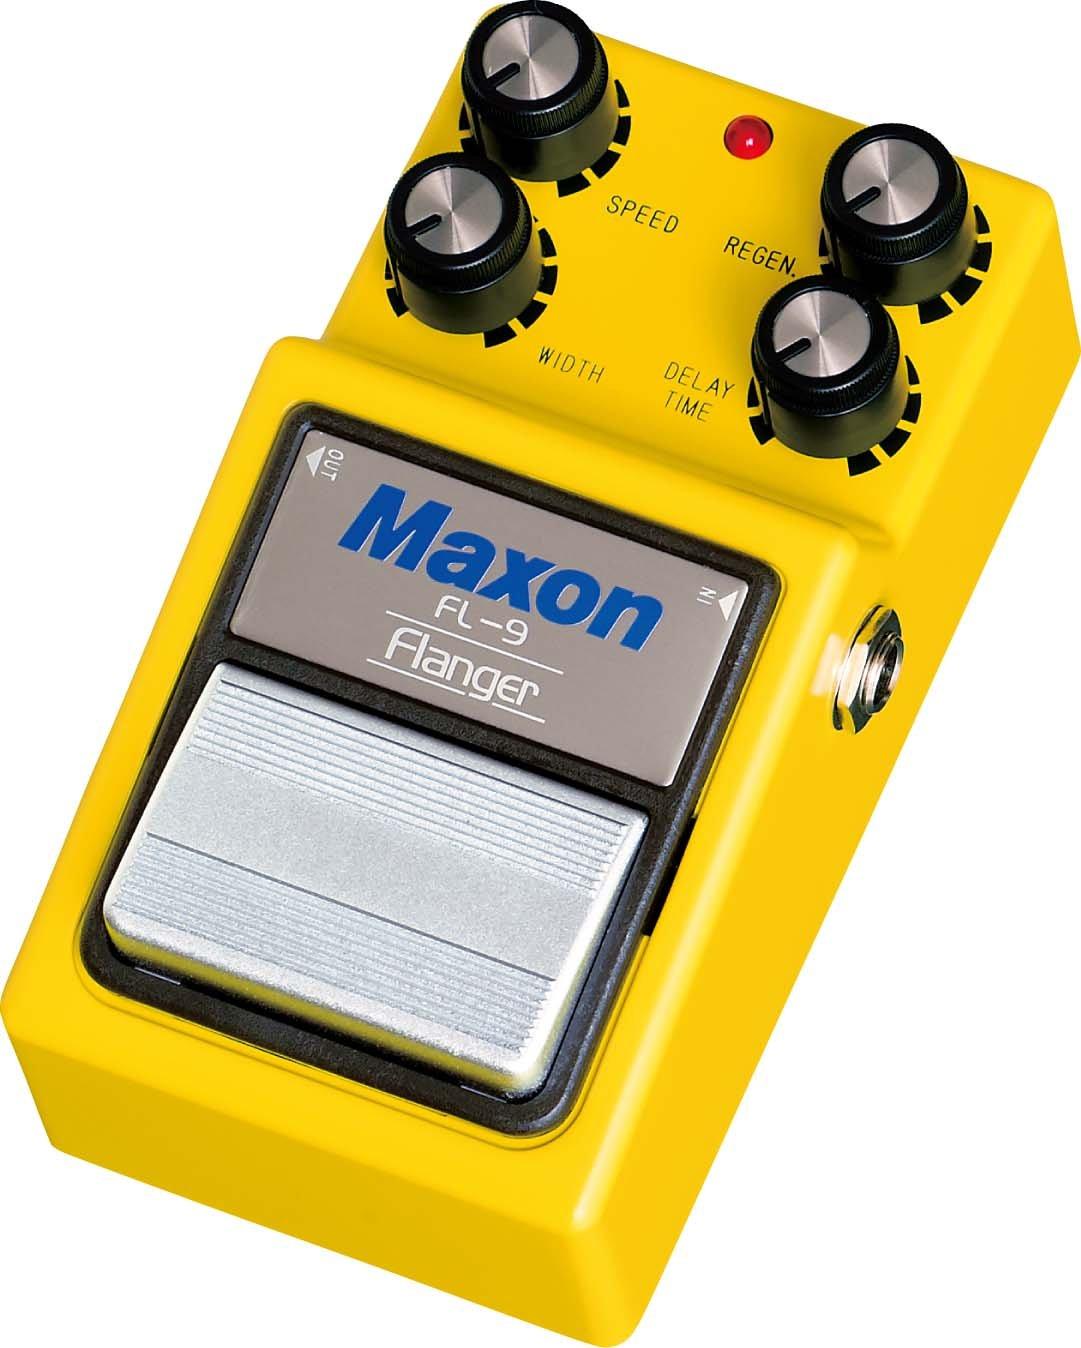 Maxon ギターエフェクター Flanger FL9   B001865A8C